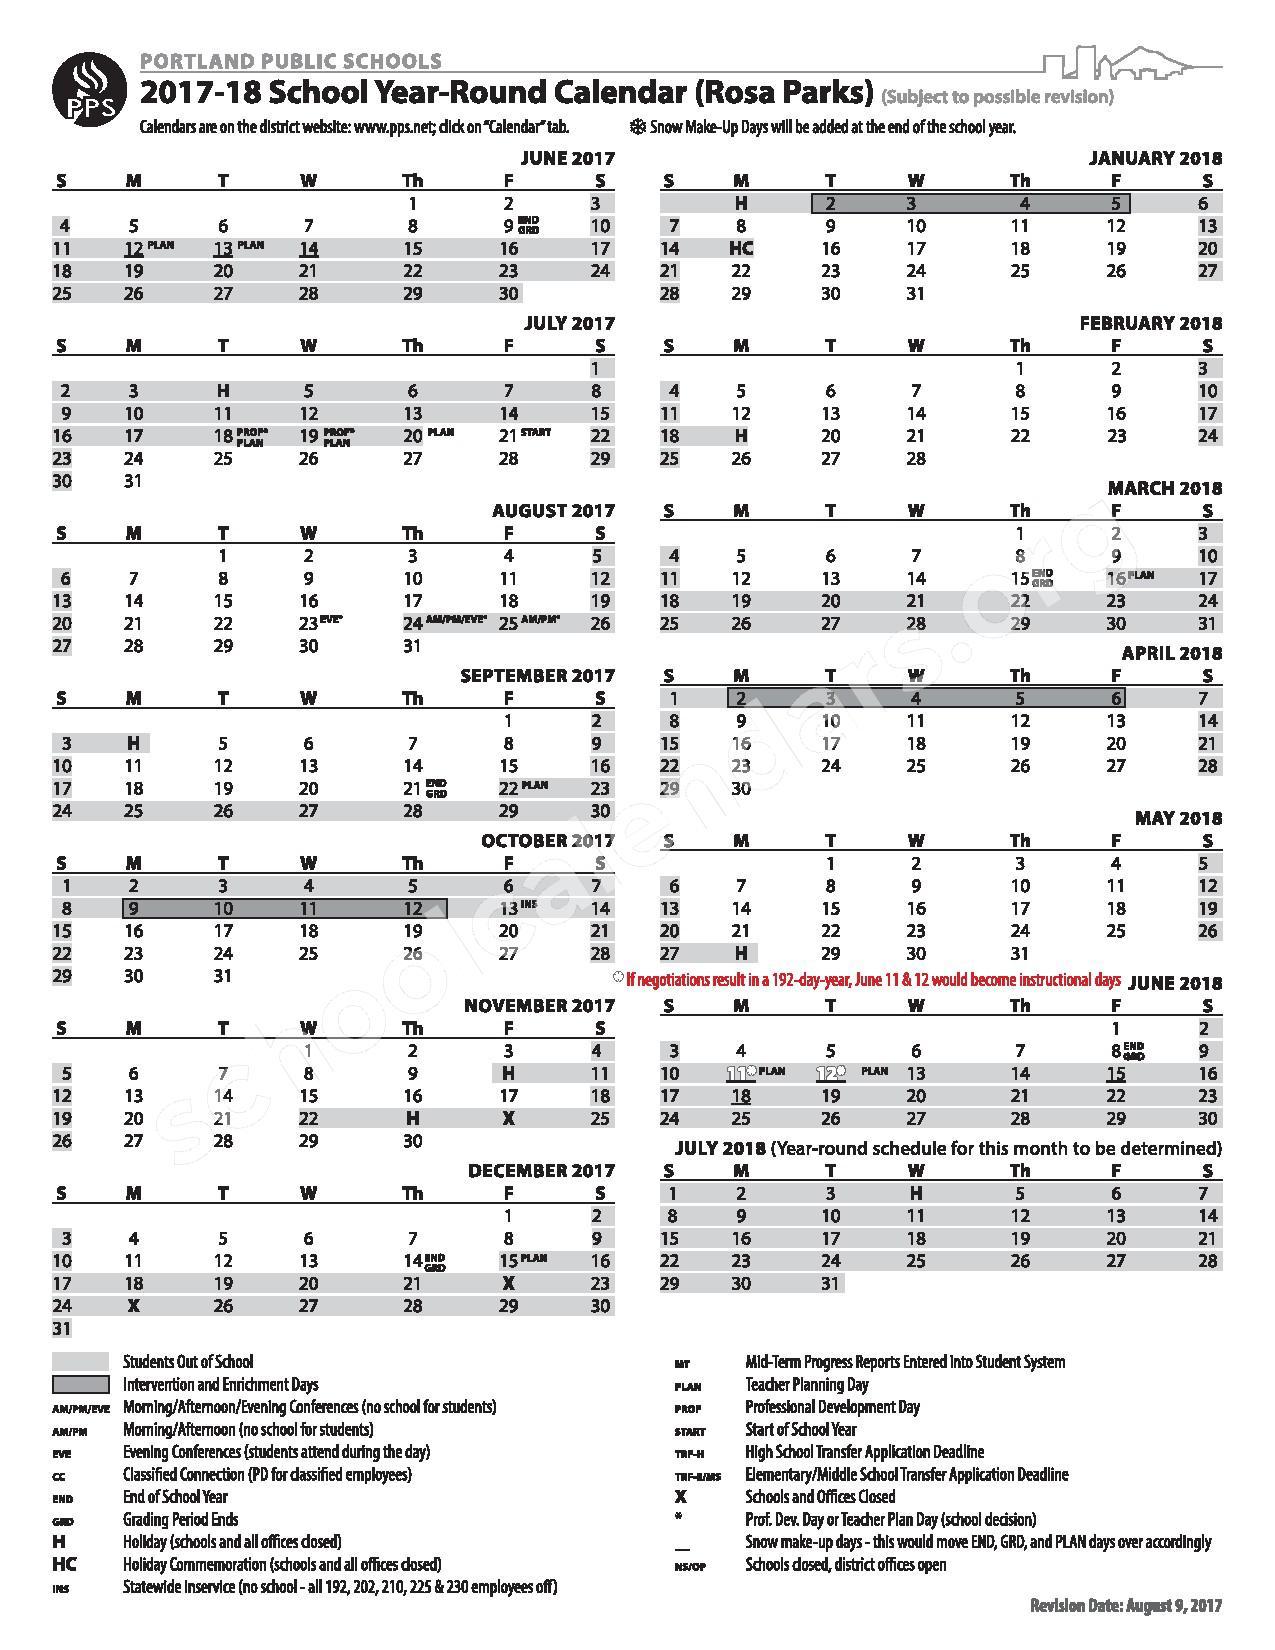 2017 - 2018 Year-Round Calendar (Rosa Parks School) – Portland Public Schools – page 1